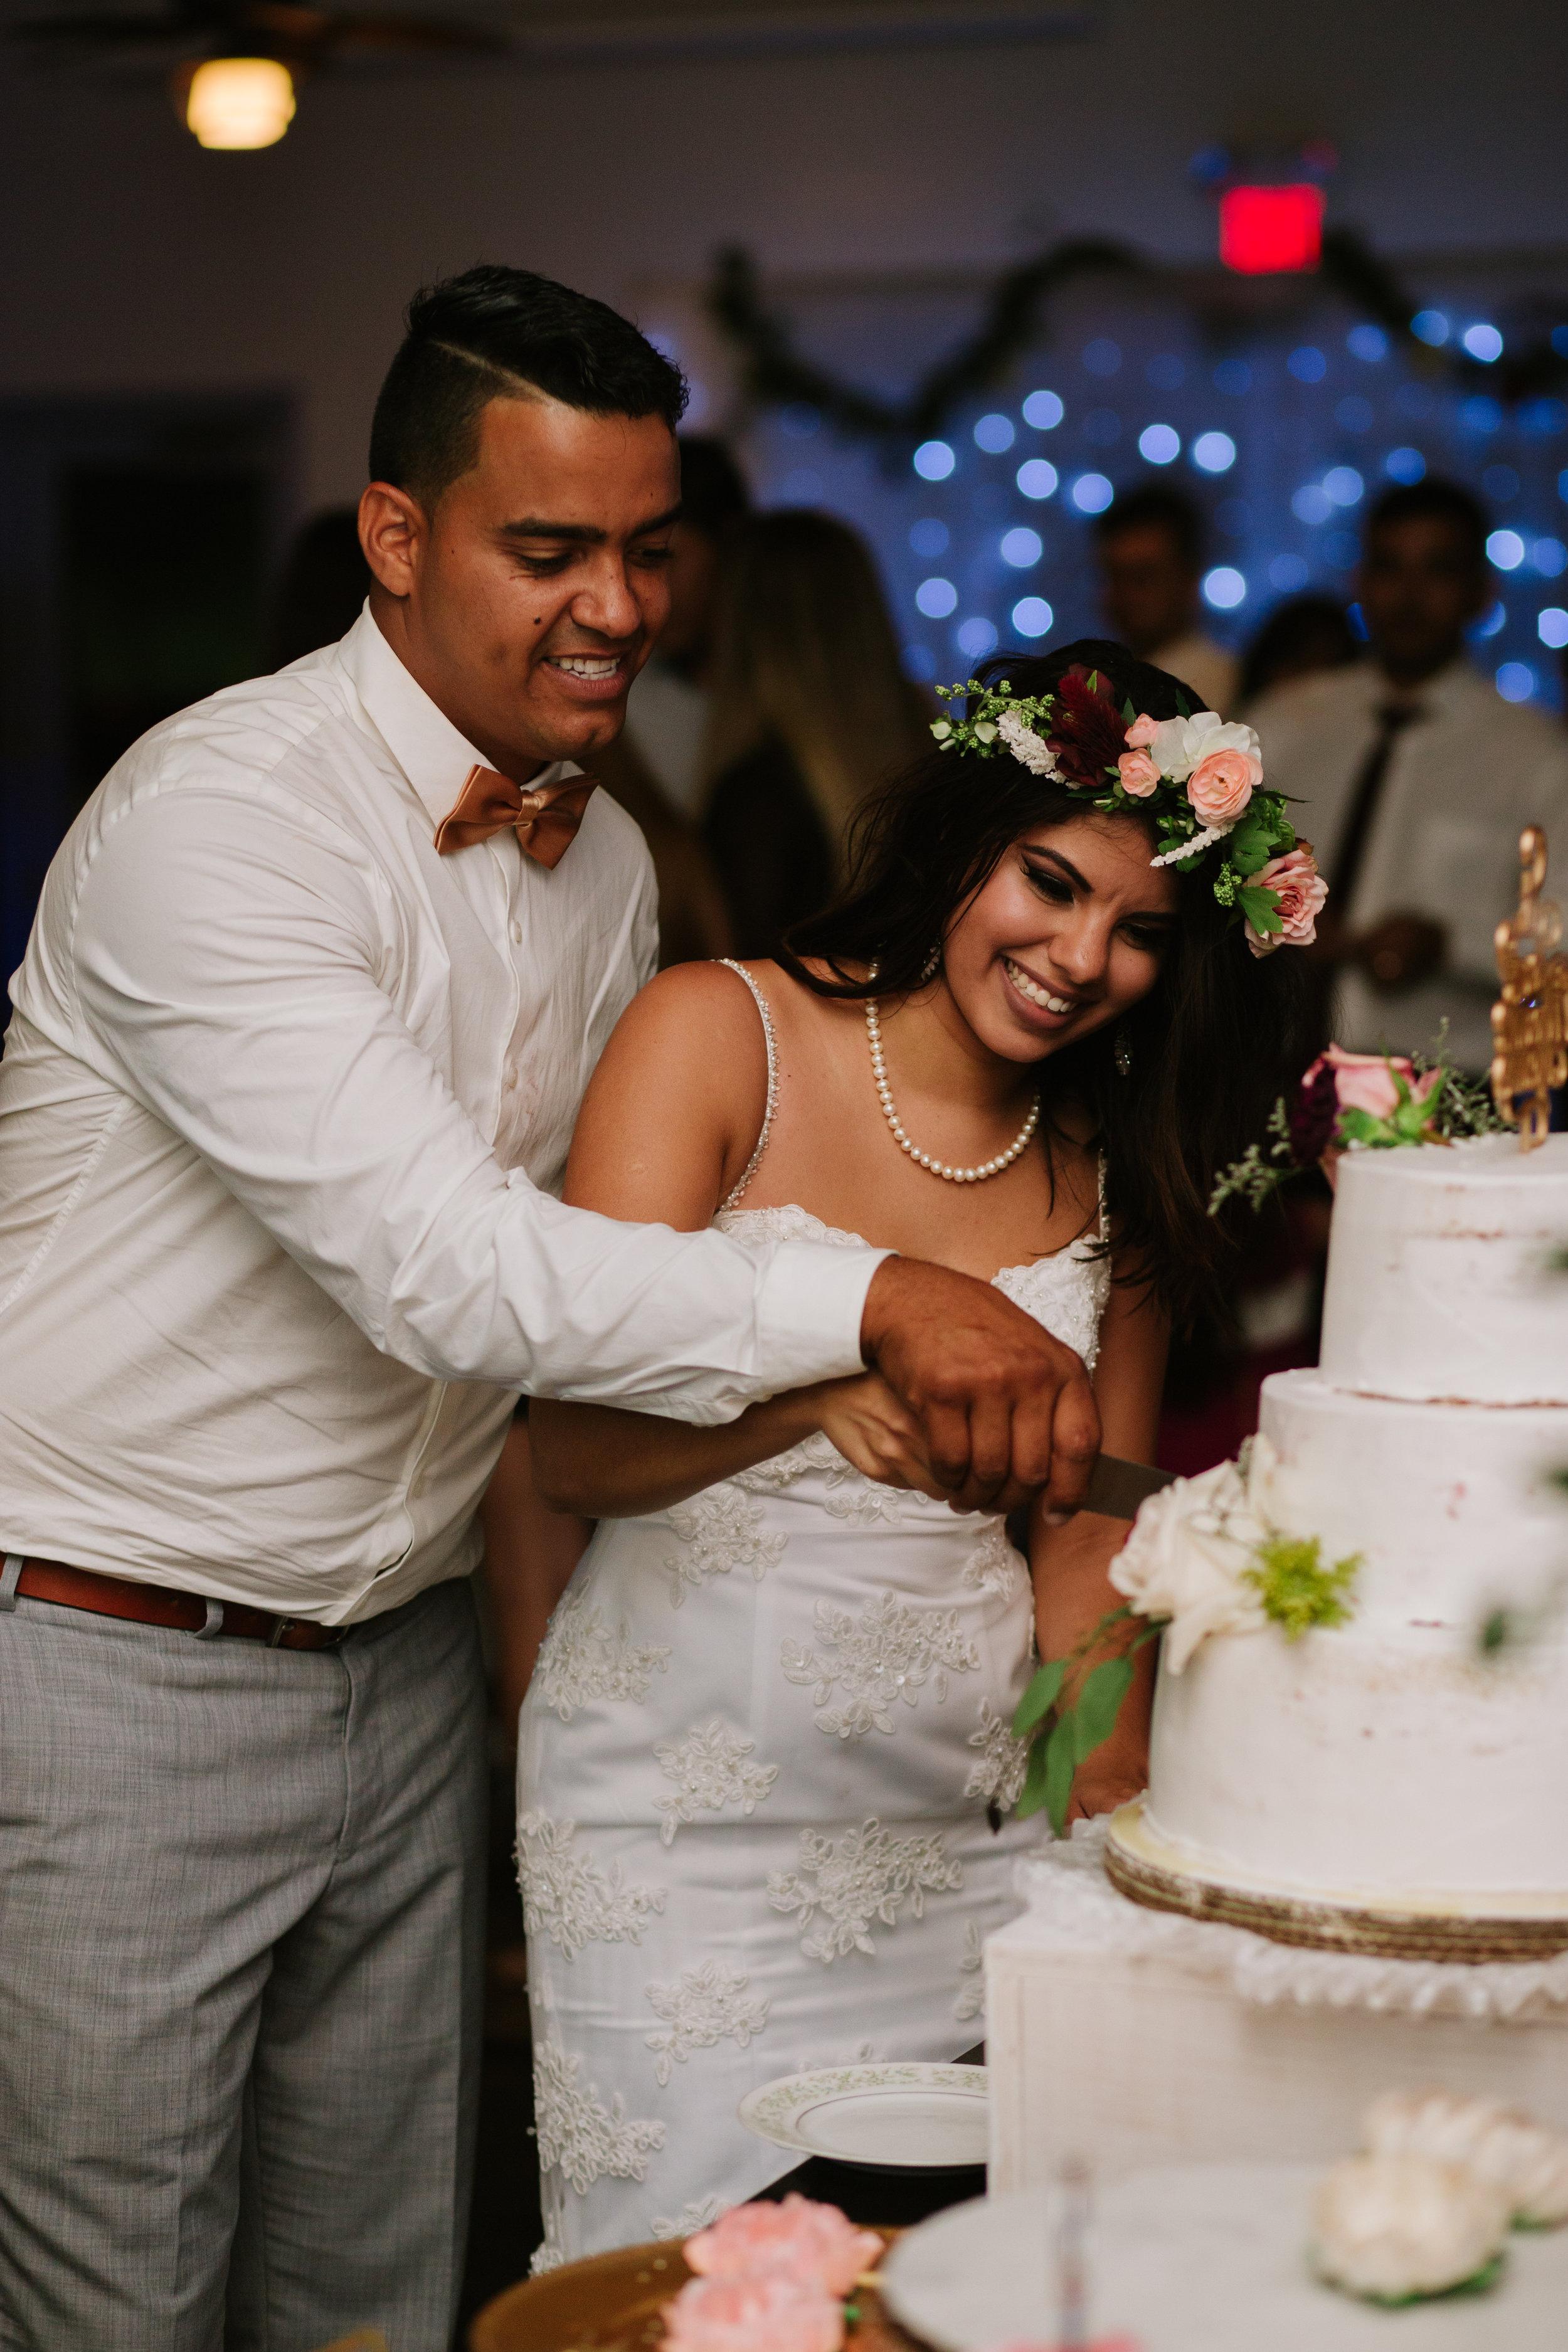 2017.05.23 Barbara and Mauricio Sales Port St Lucie Wedding (746 of 772).jpg